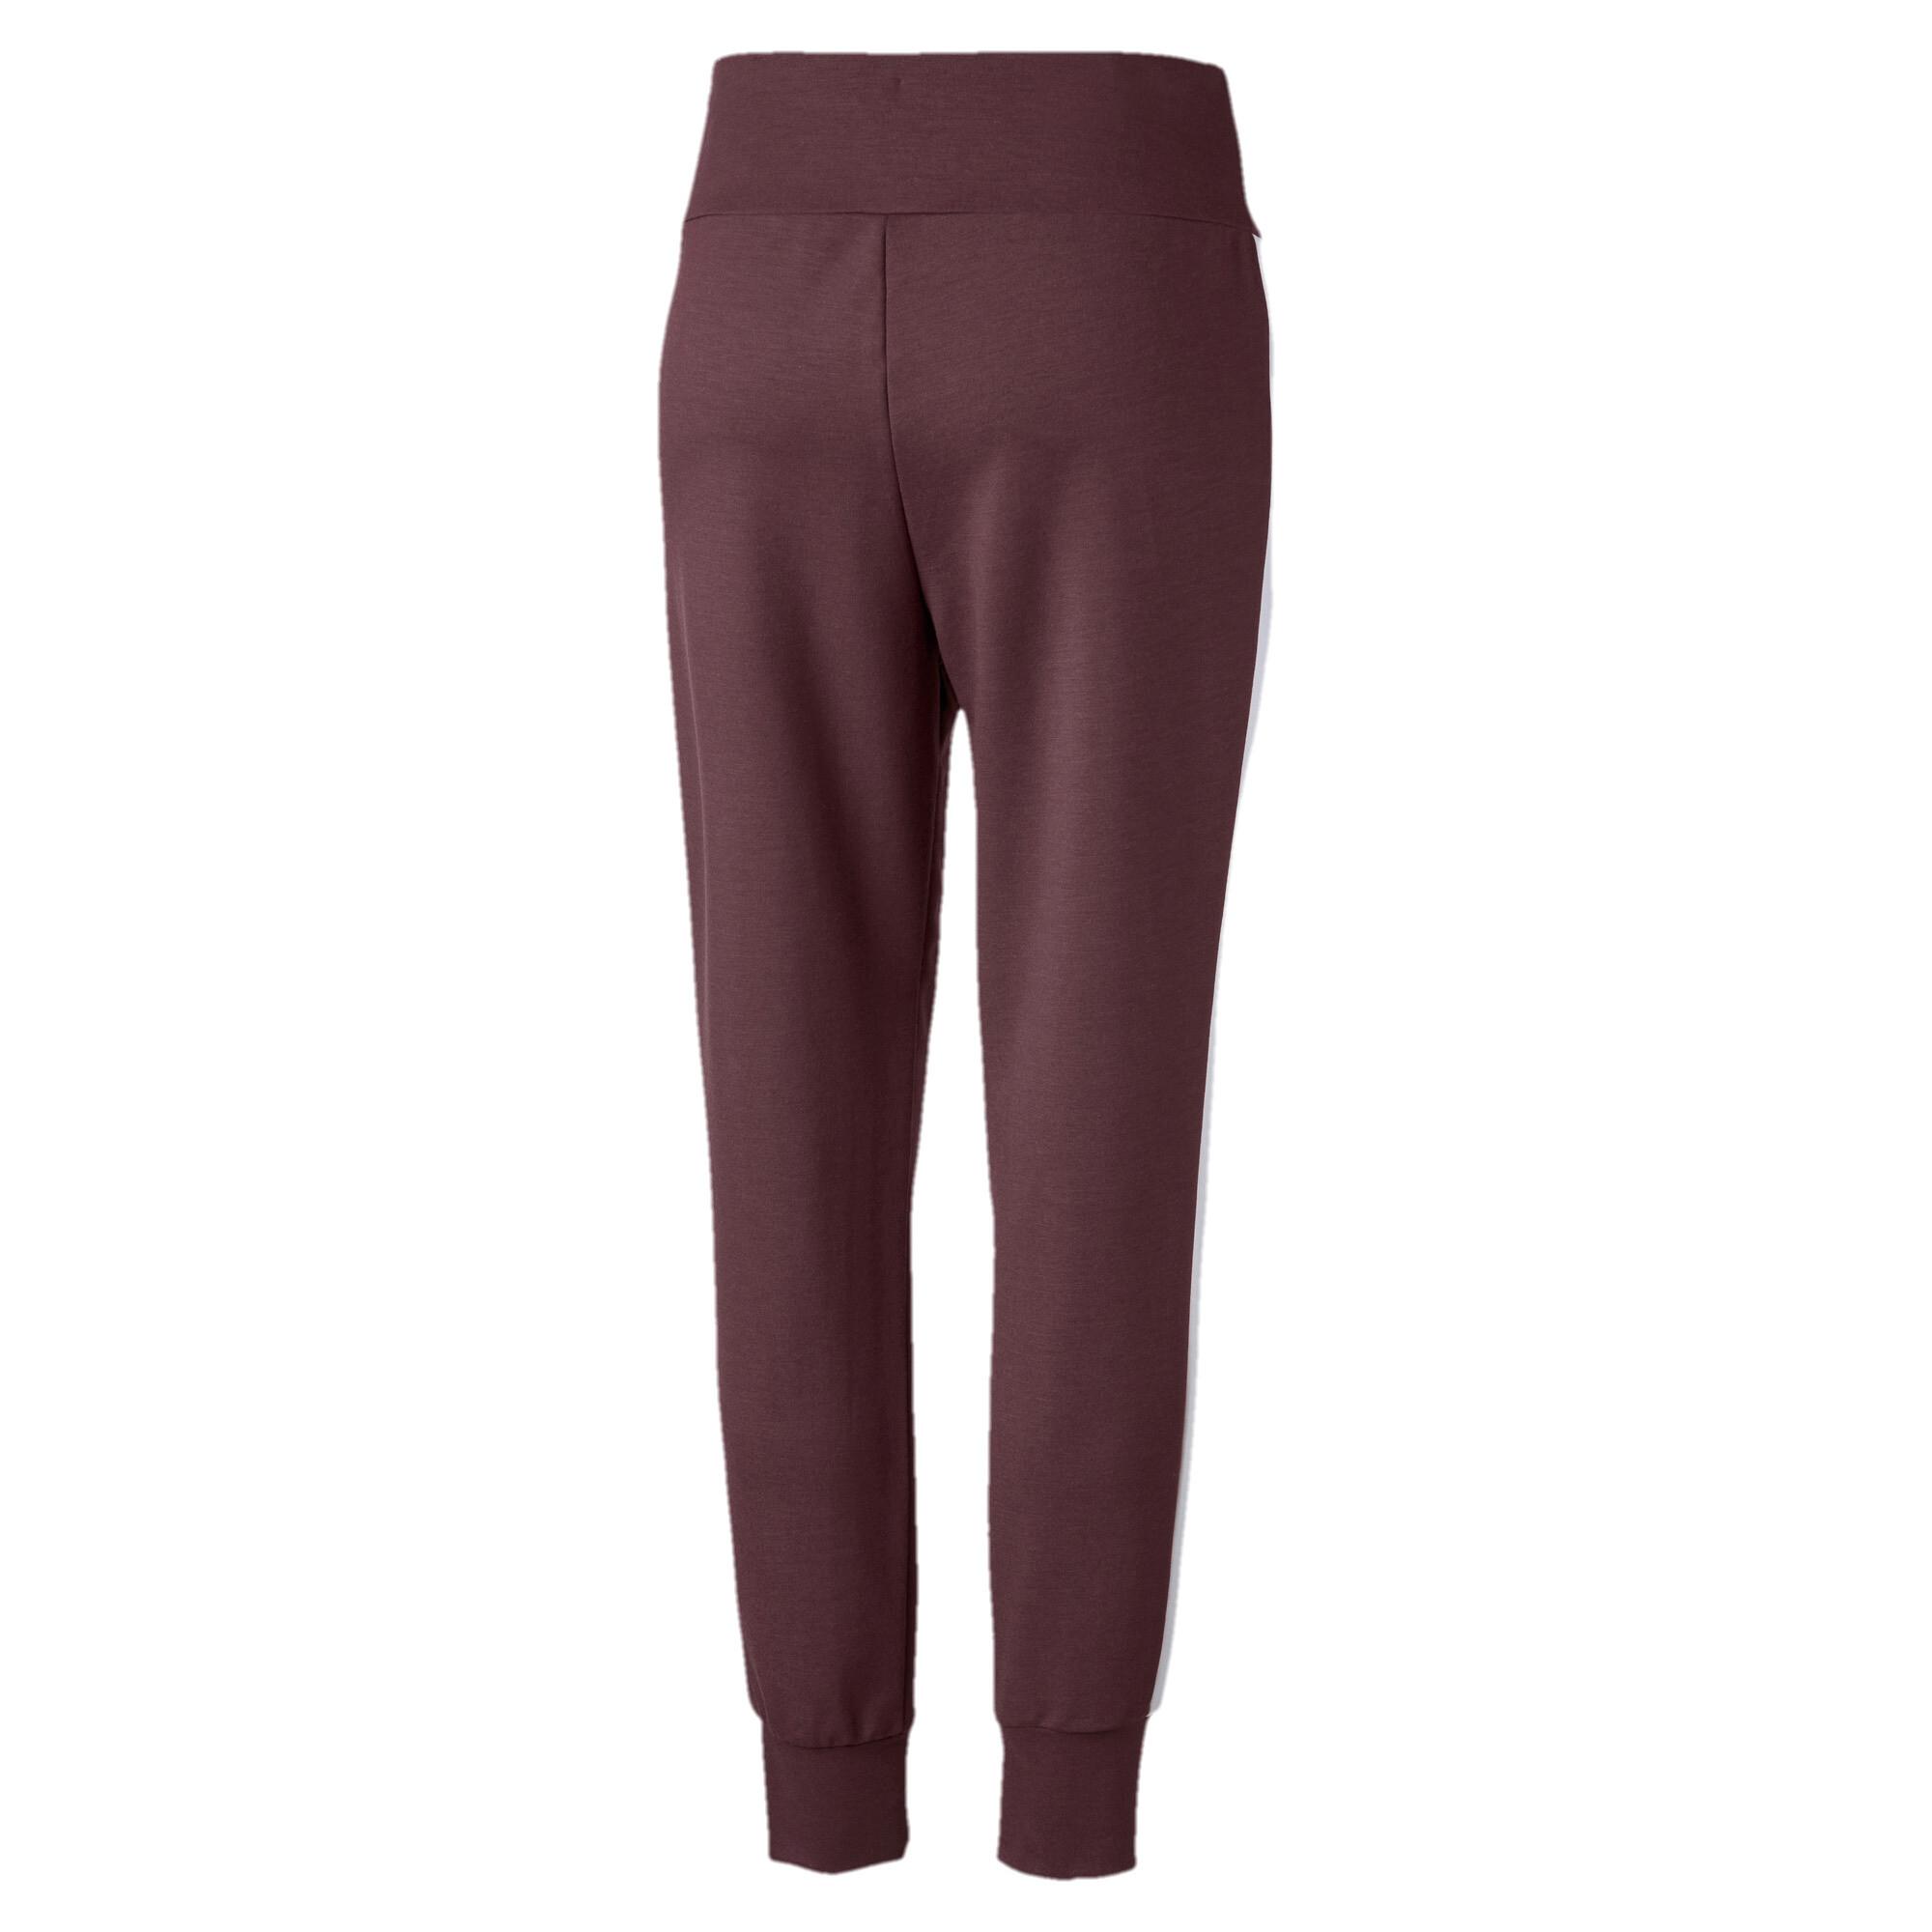 PUMA-Modern-Sports-Women-039-s-Track-Pants-Women-Knitted-Pants-Basics thumbnail 3